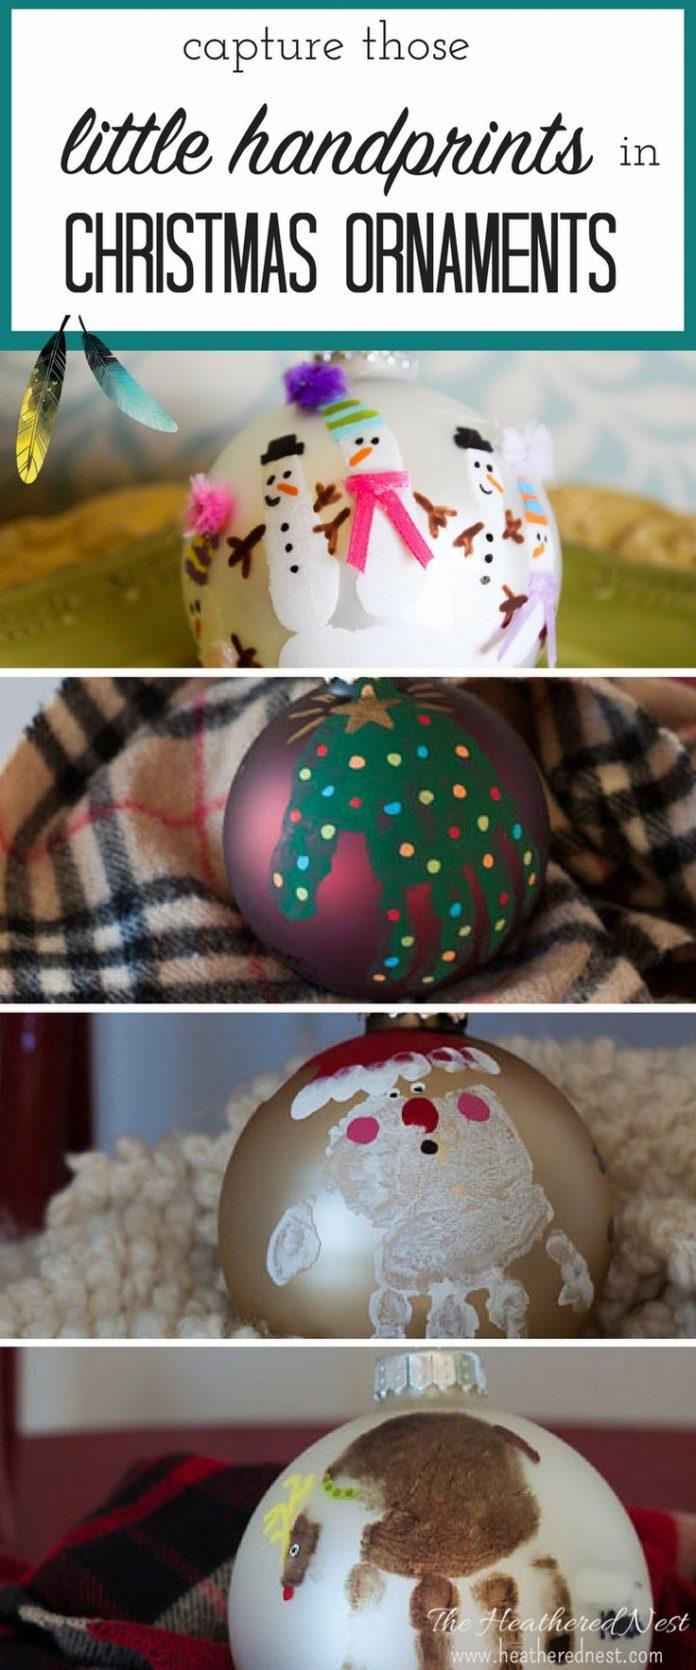 Diy home decor ideas diy handprint christmas ornament for Easy diy home decorations